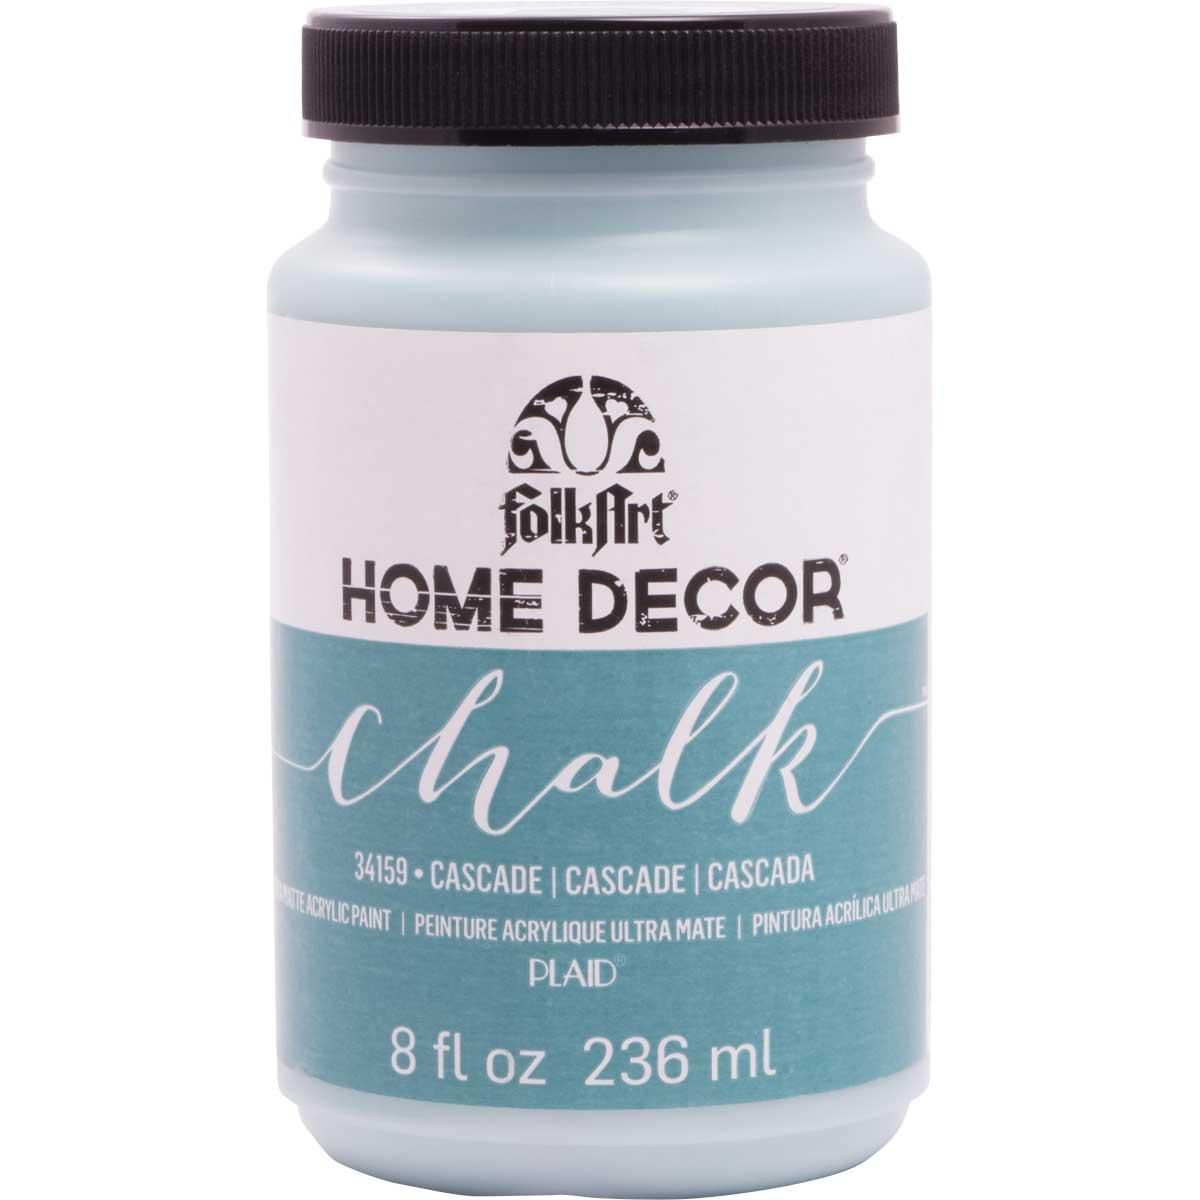 FolkArt ® Home Decor™ Chalk - Cascade, 8 oz. - 34159